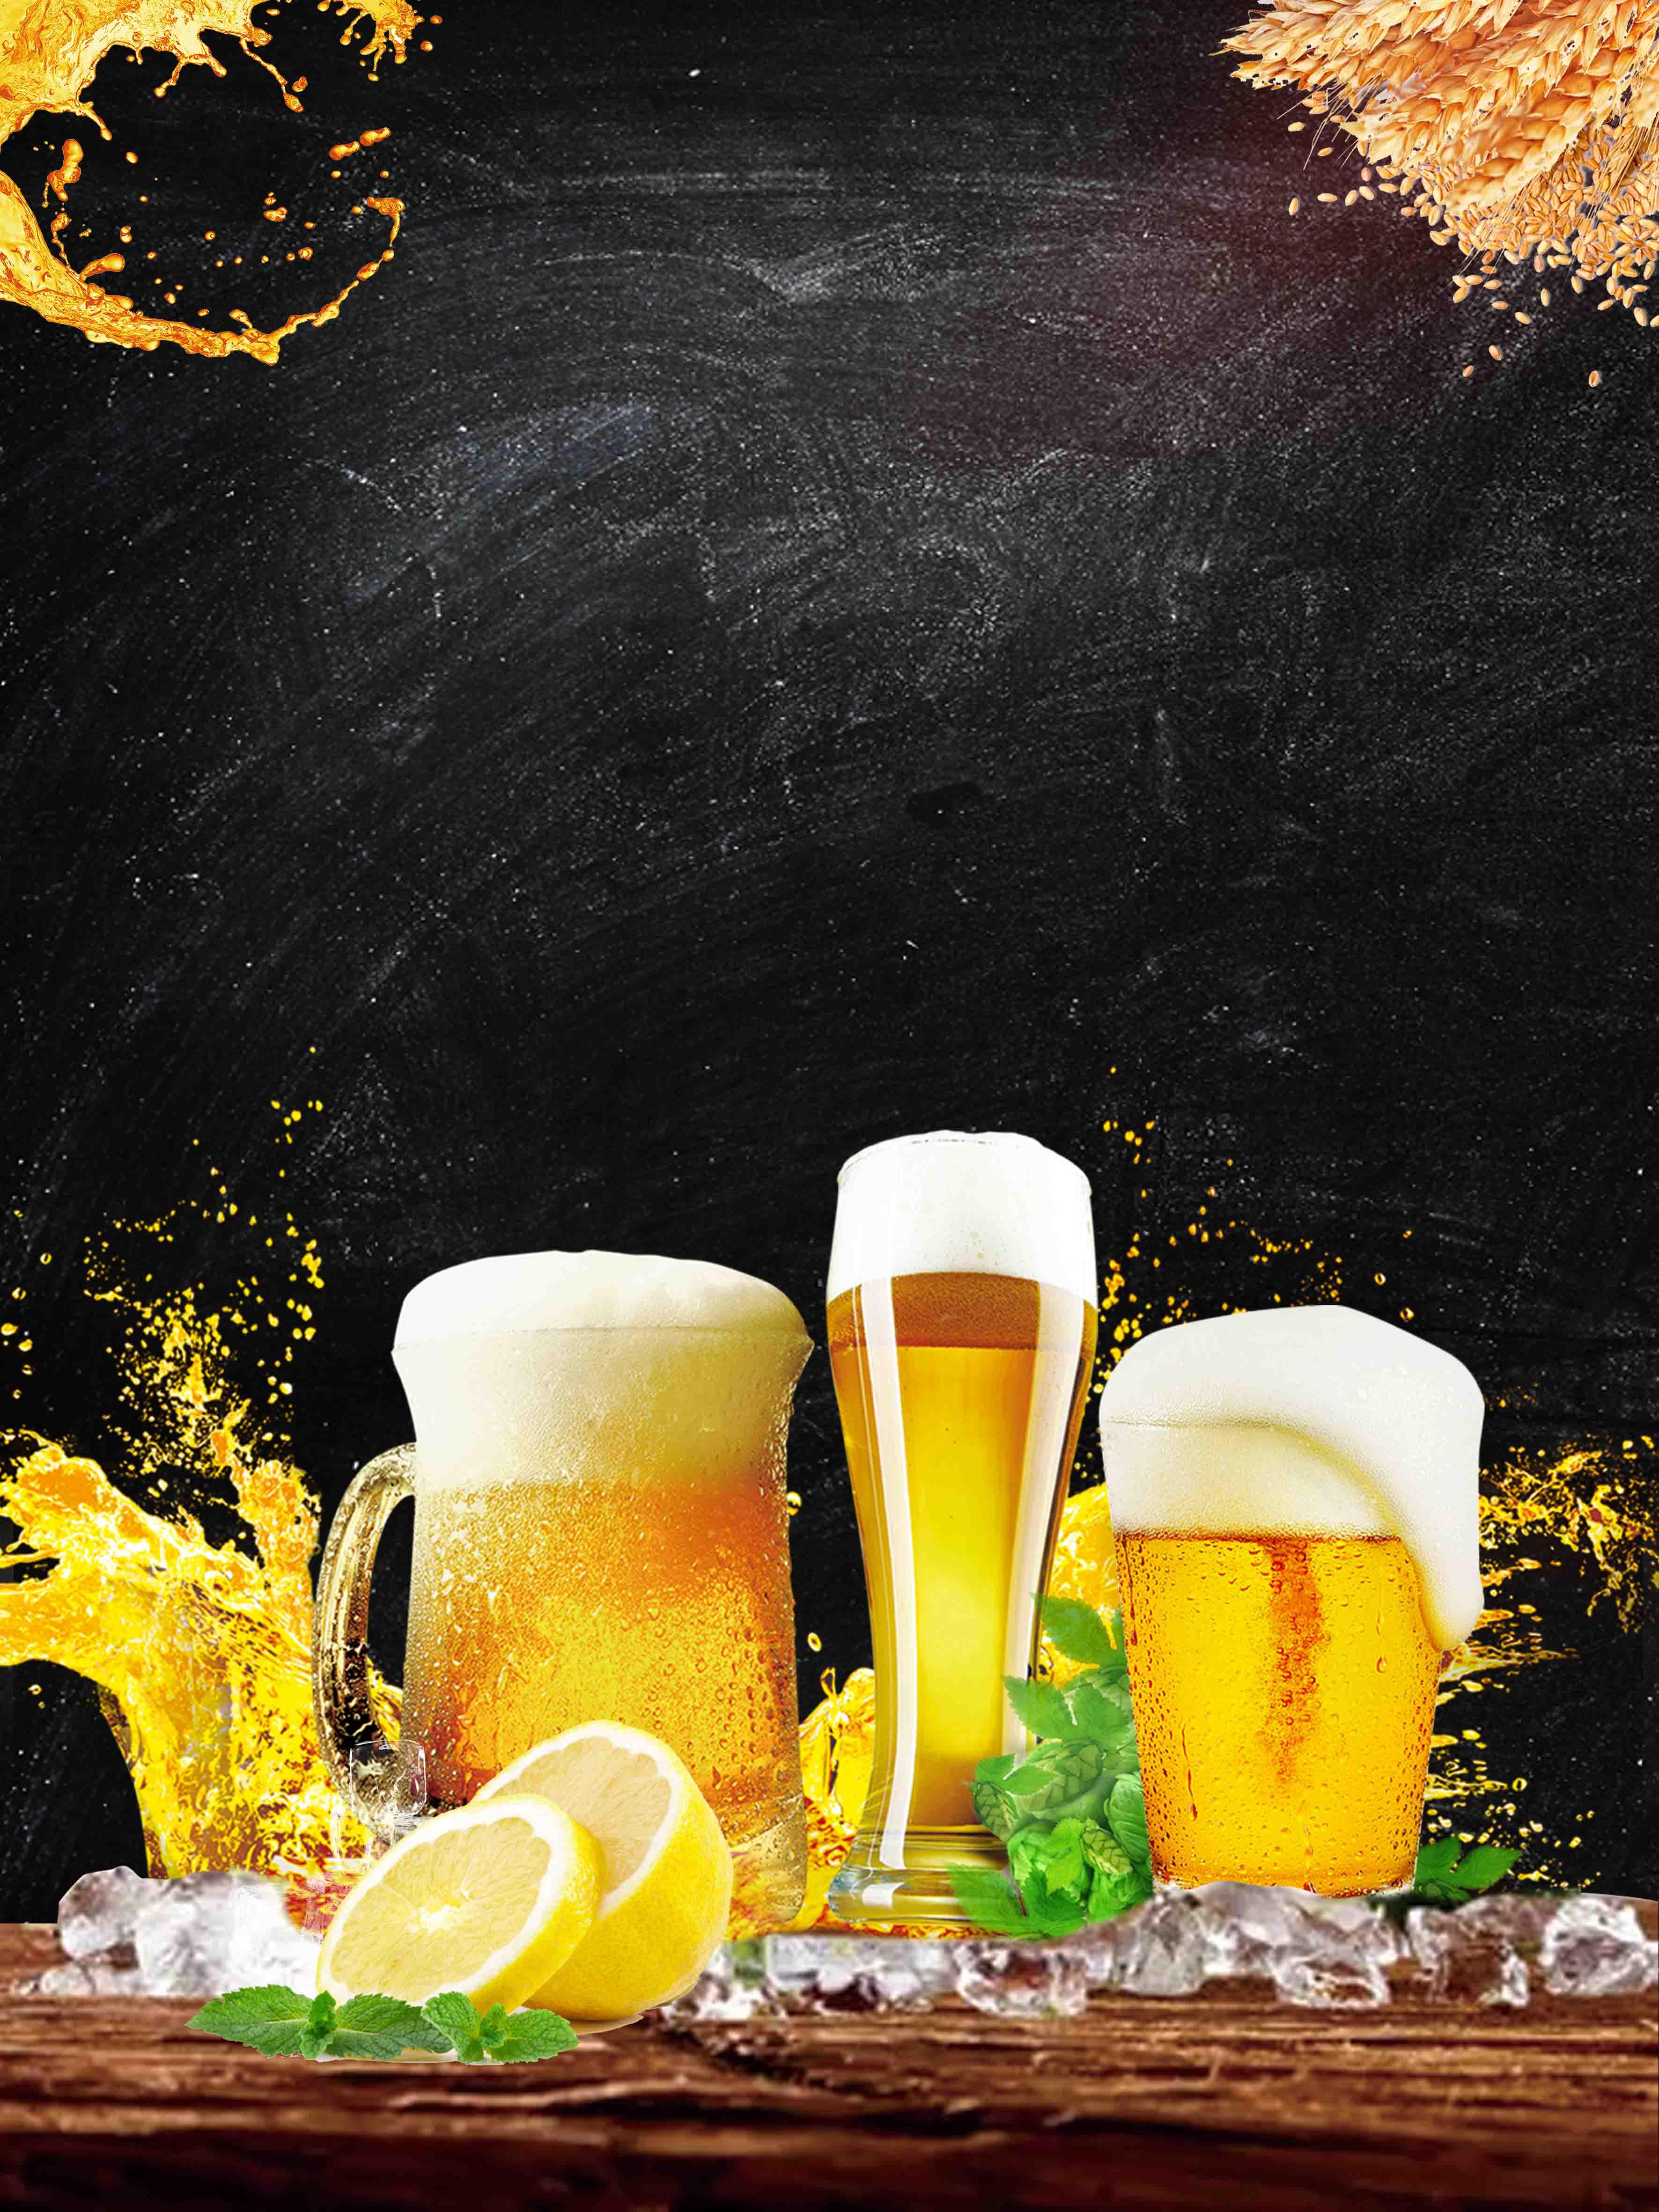 creative iced beer promotion  iced  beer  oktoberfest